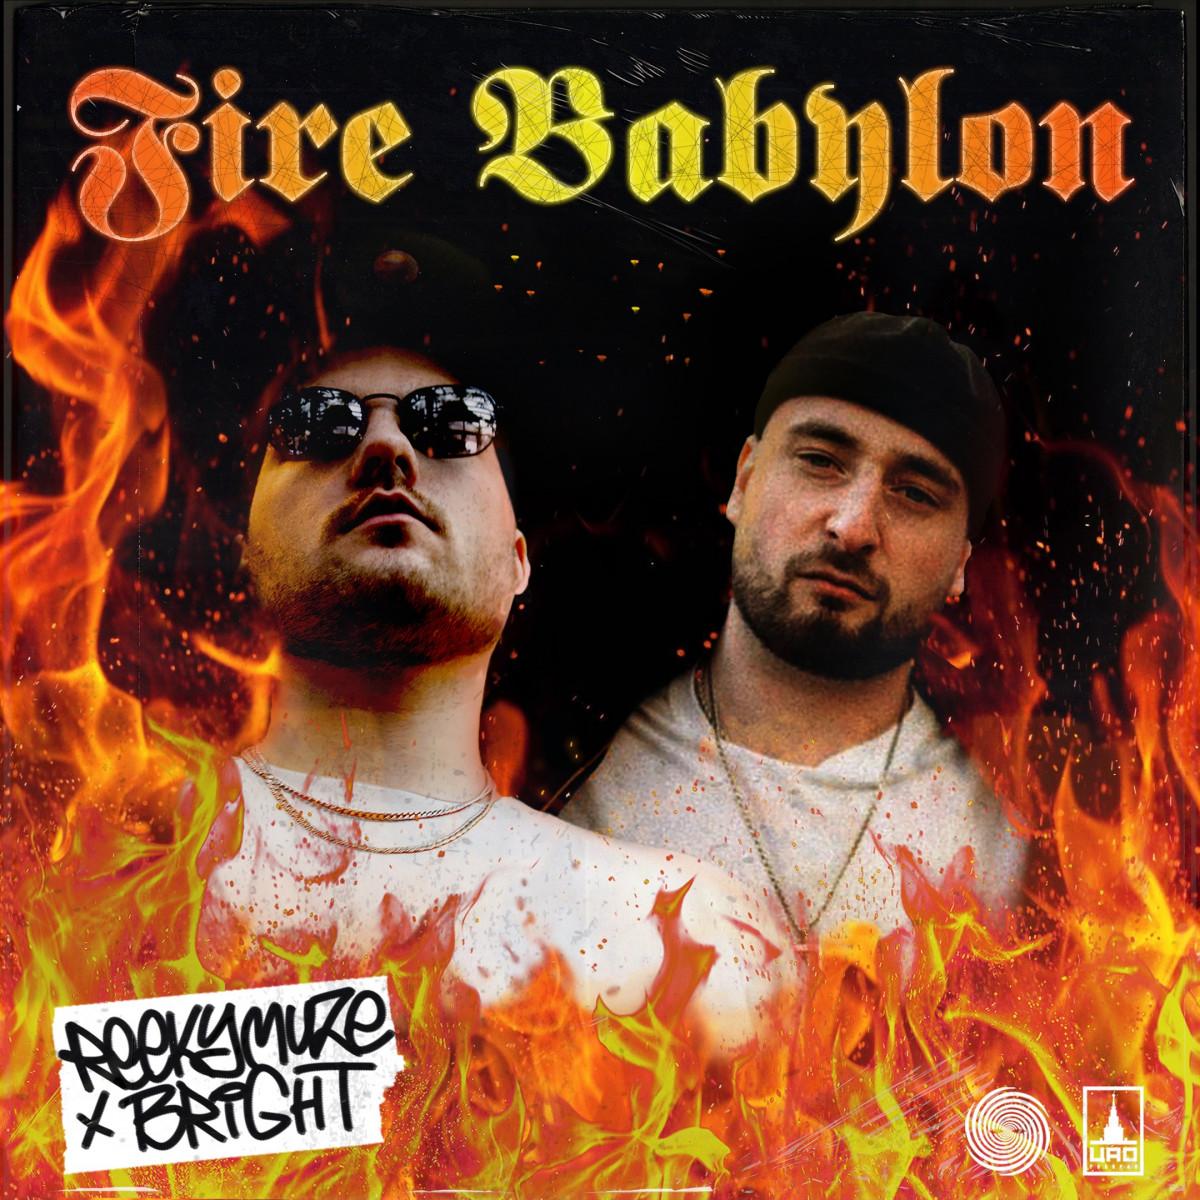 REEKYMUZE X Bright — «Fire Babylon»